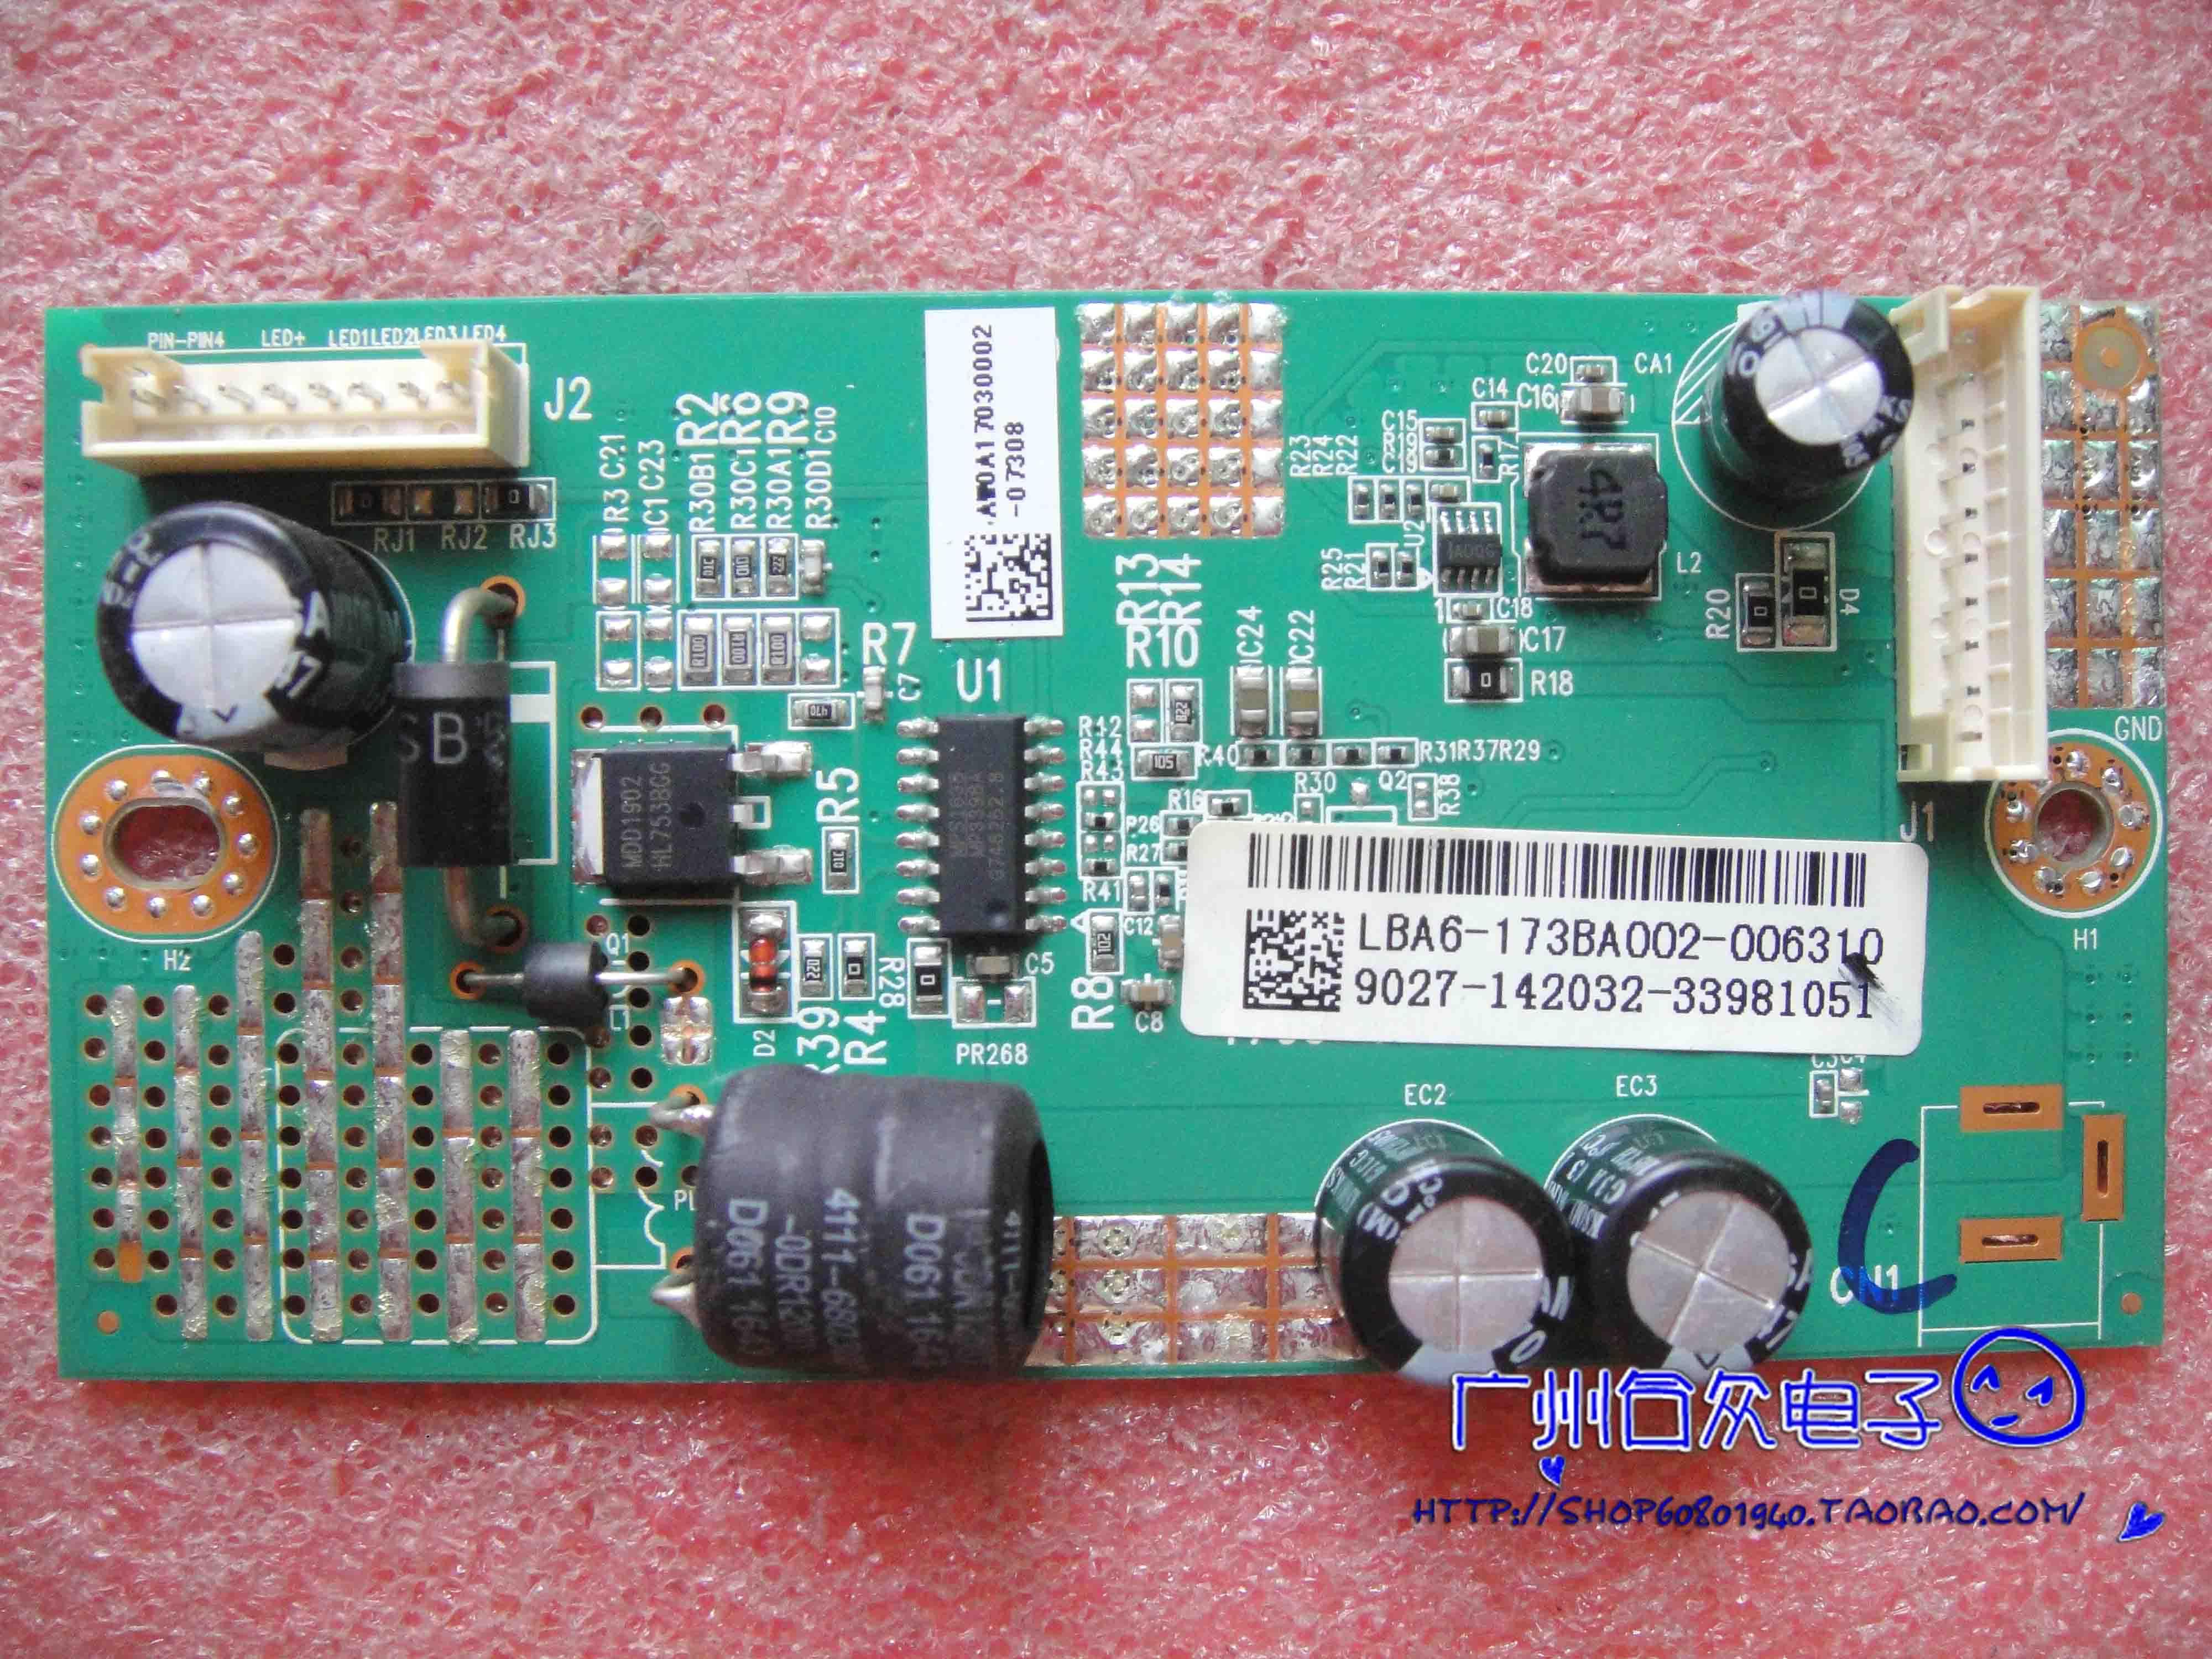 ELSA E32B318C 4705-000000-A1233101 A2 ارتفاع ضغط لوحة/l حامل